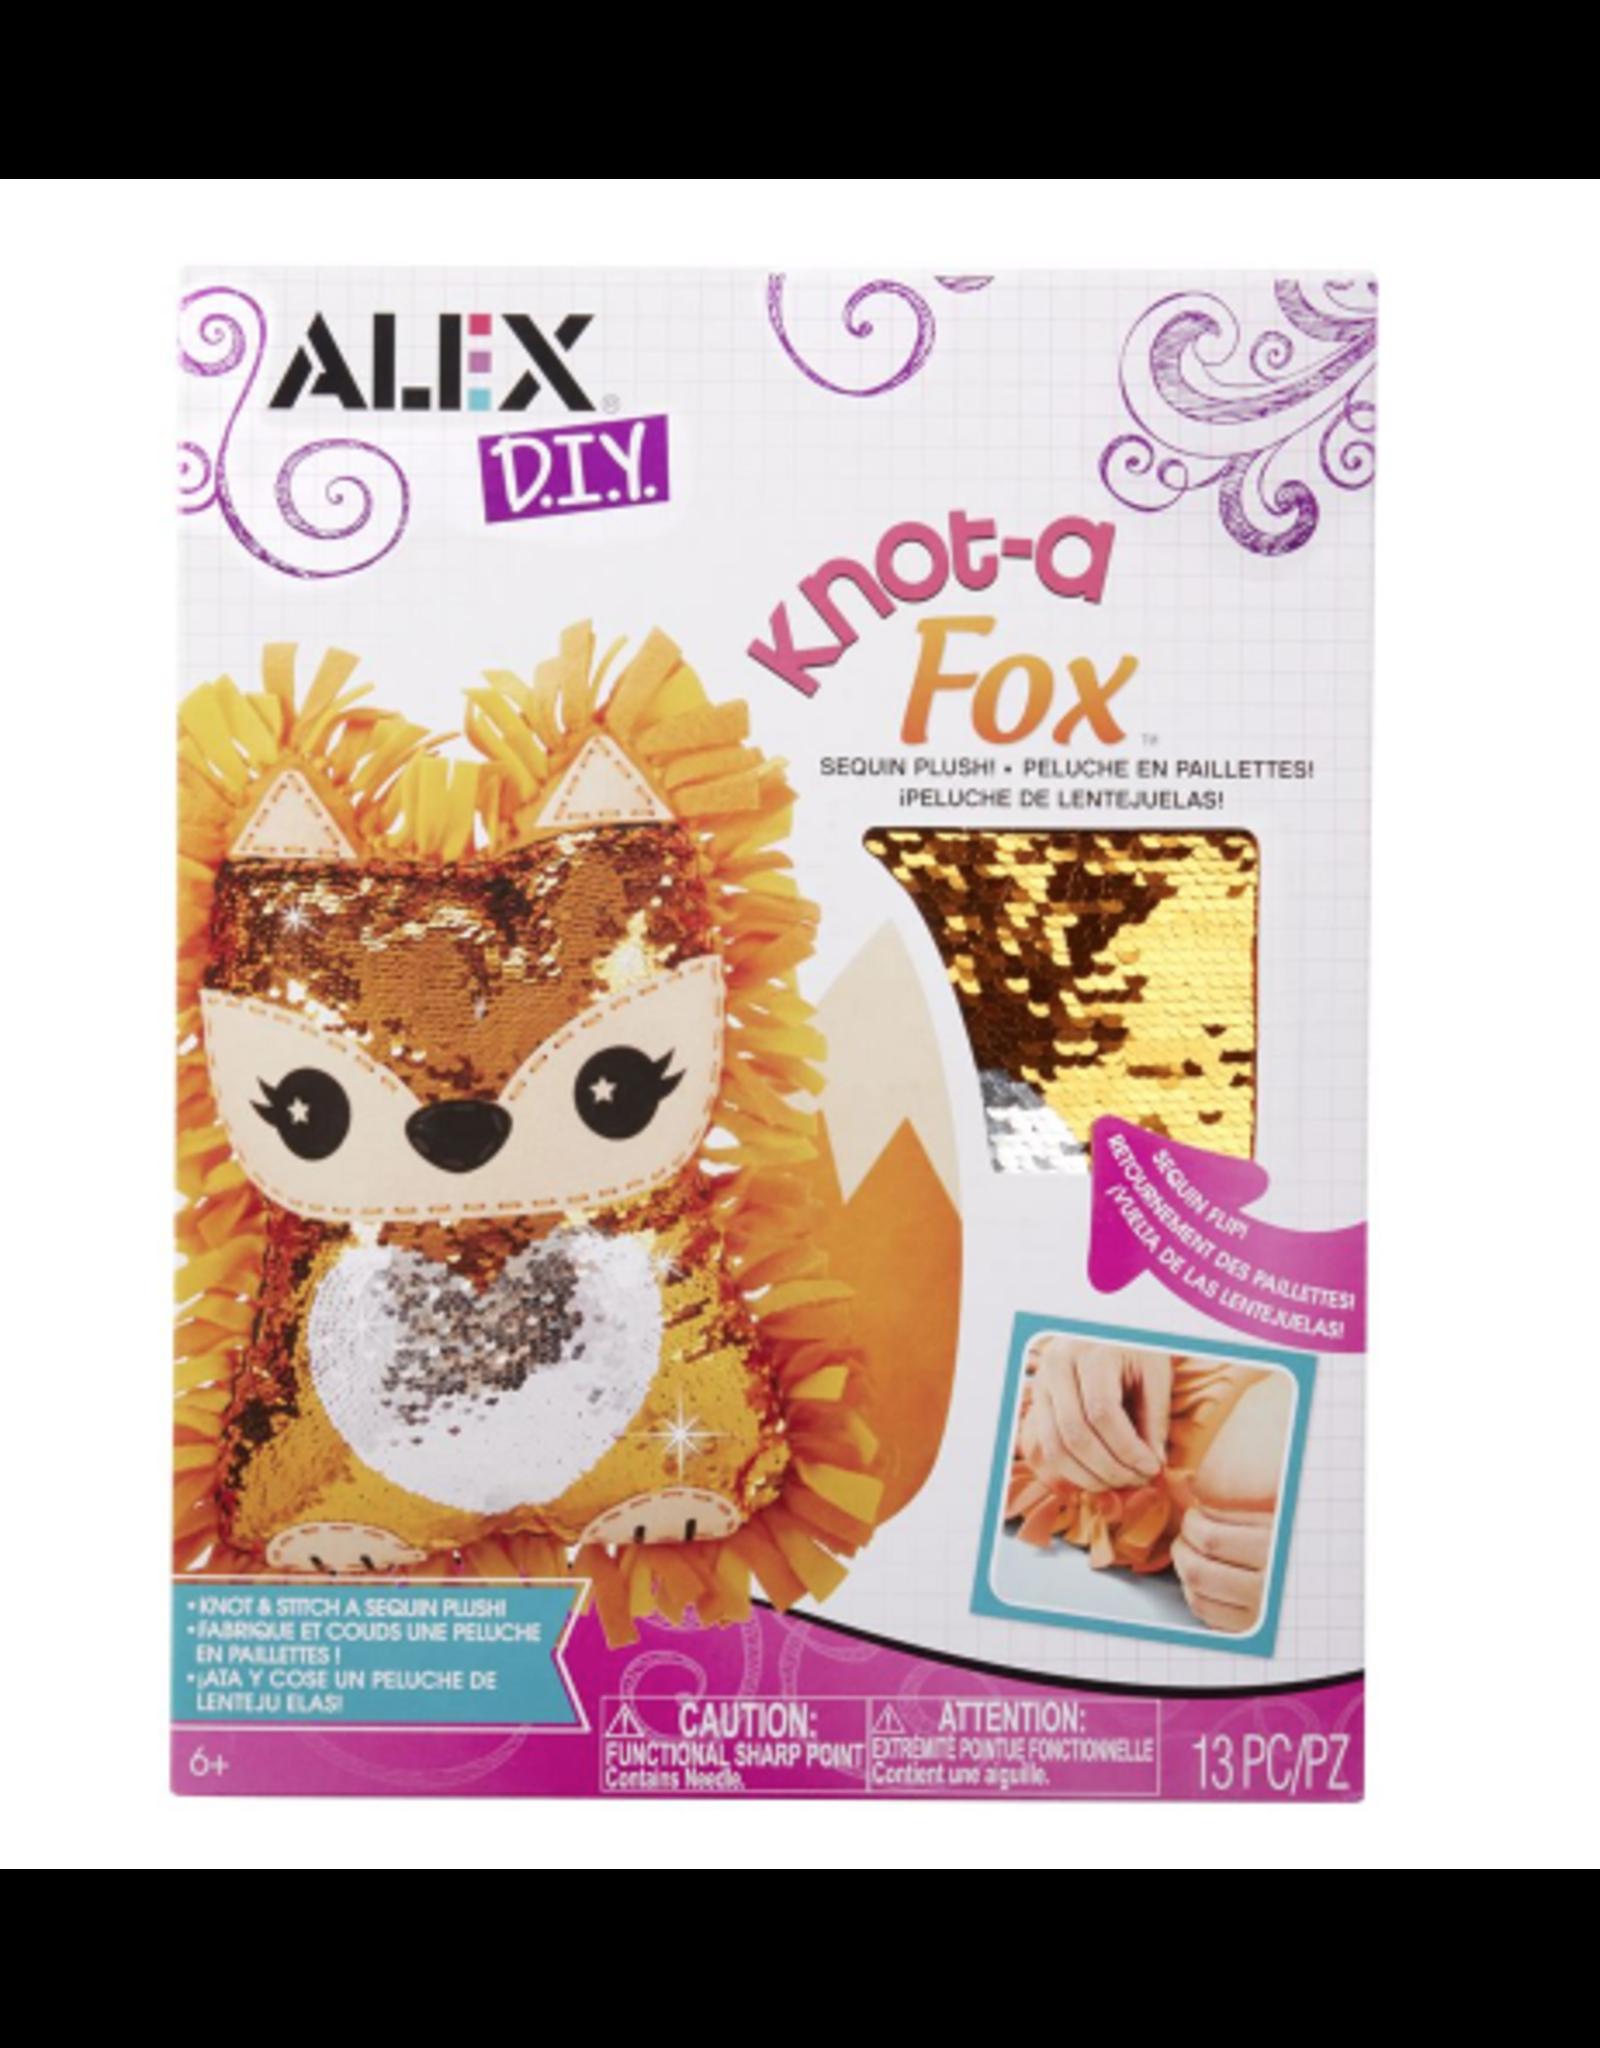 ALEX DIY Knot a Fox Sequin Plush Kit